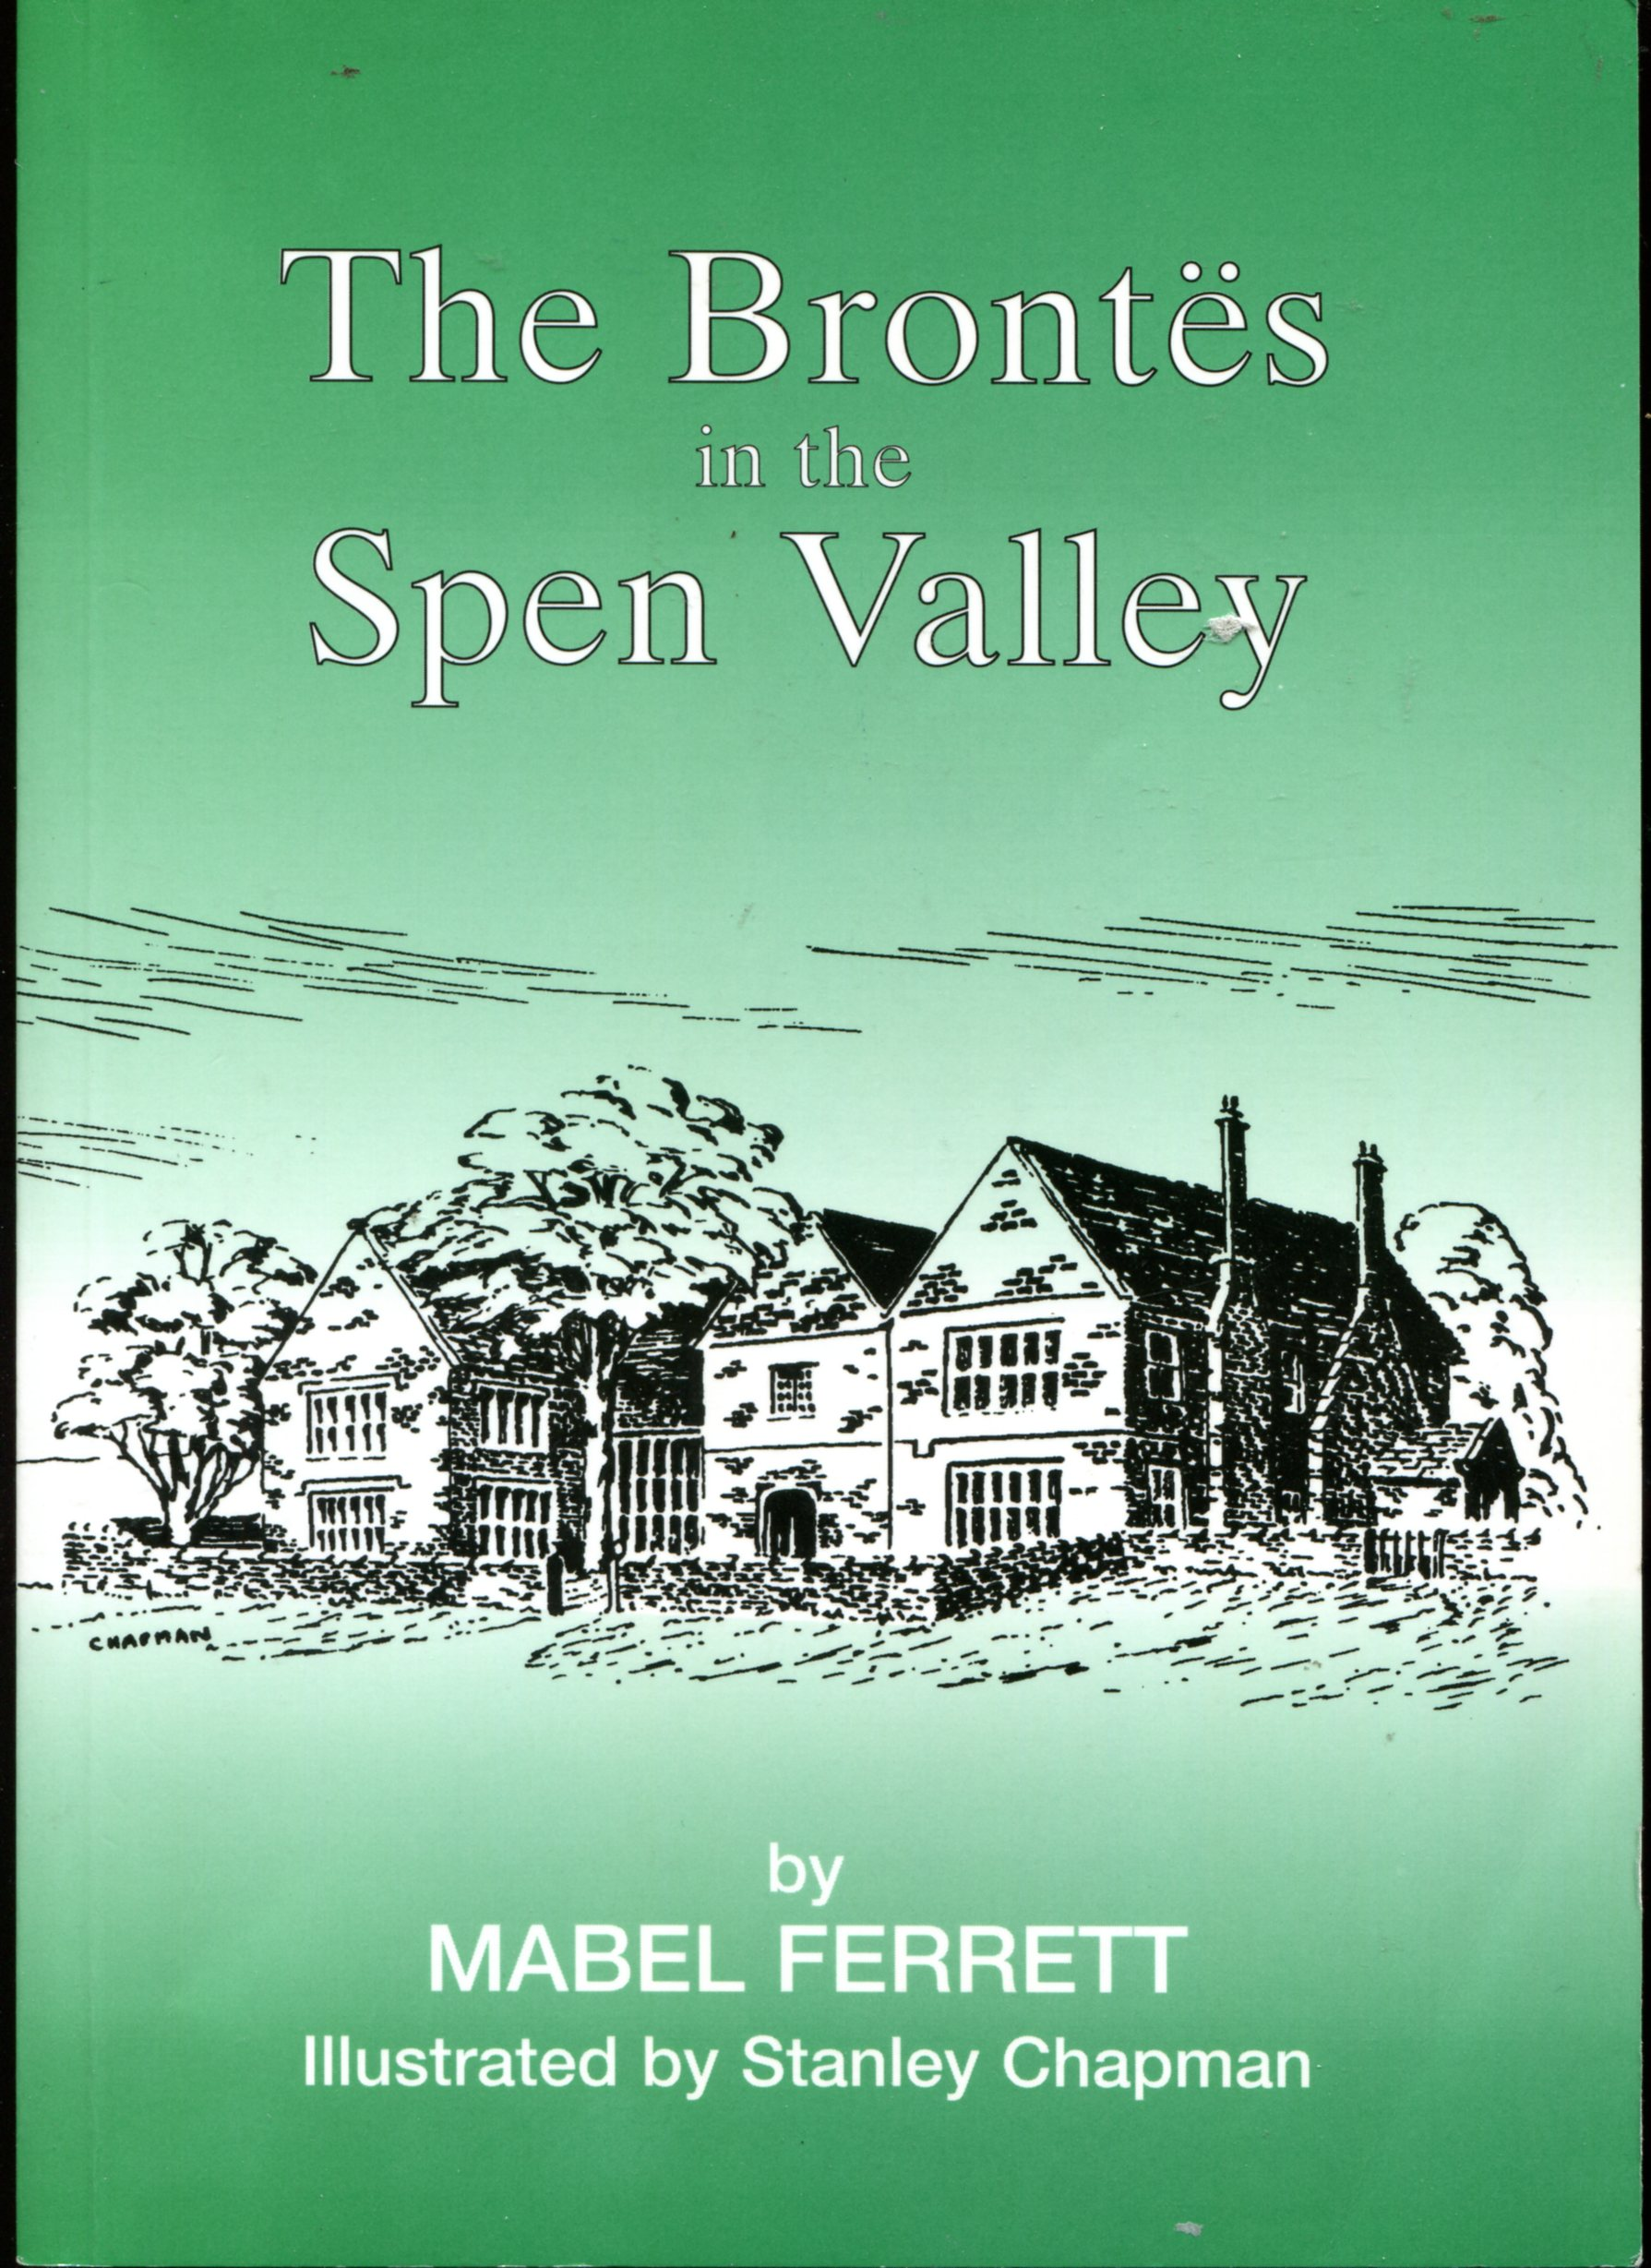 Mabel Ferrett Brontes in Spen Valley 029